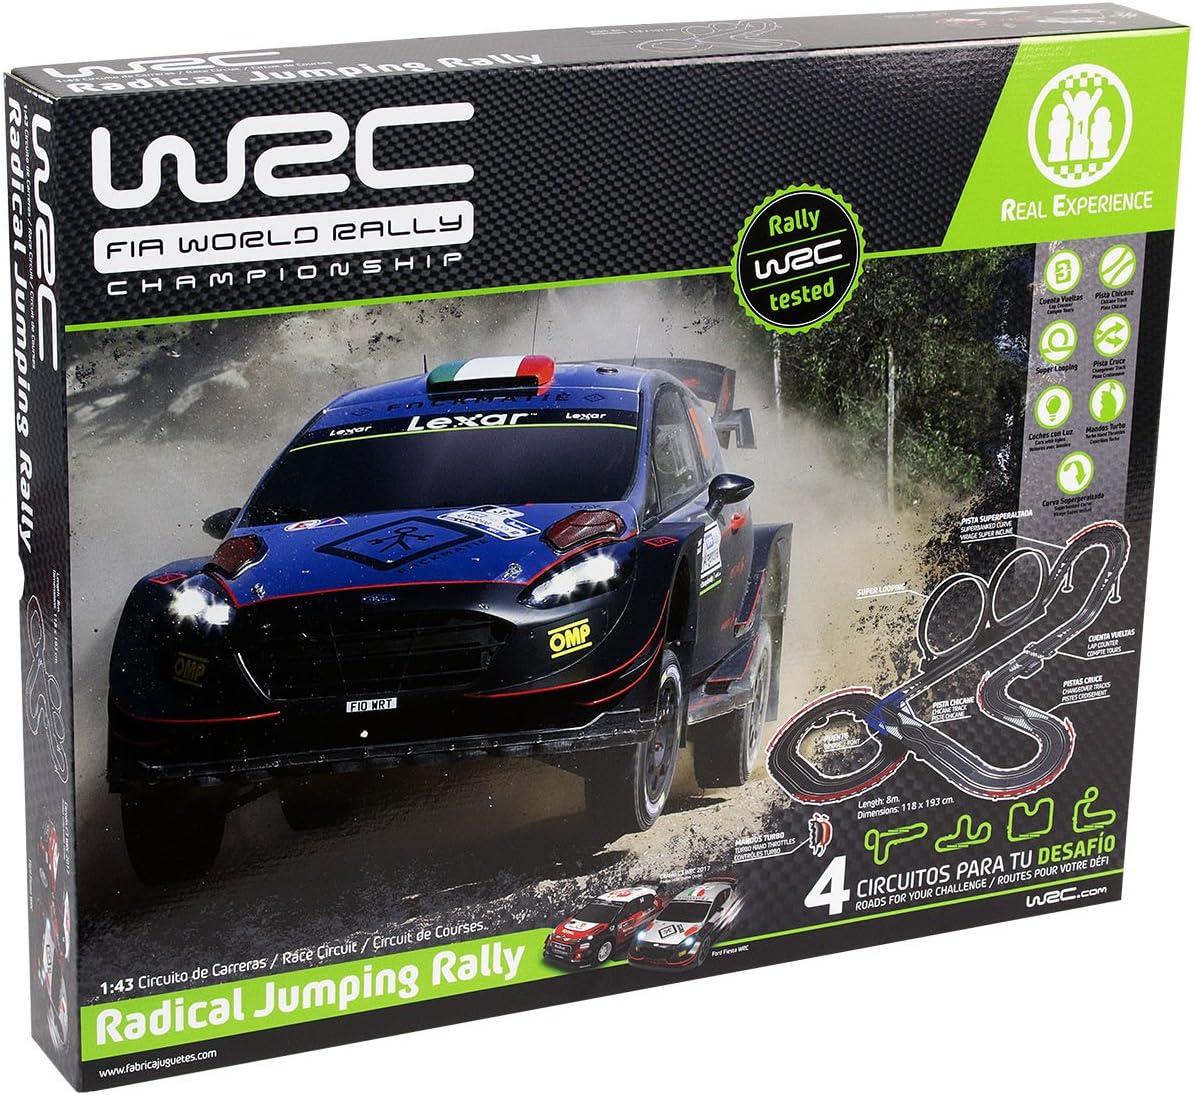 Wrc 91003.0 Wrc Radical Jumping Rally